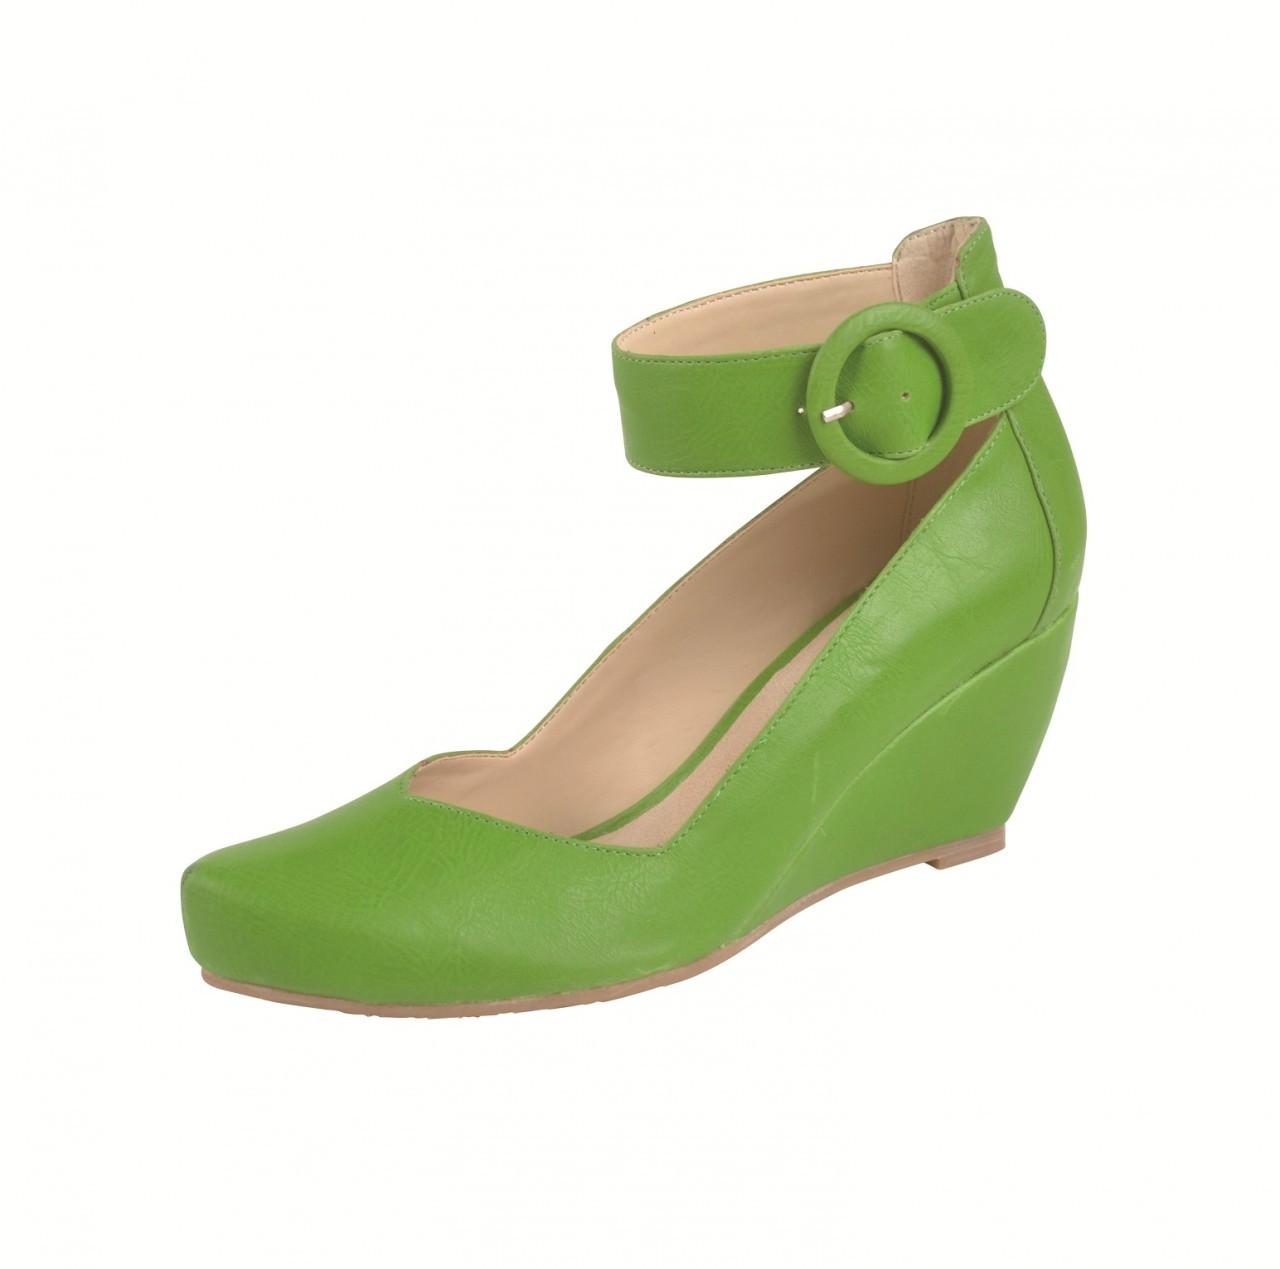 Neuaura Saya Green wedges.